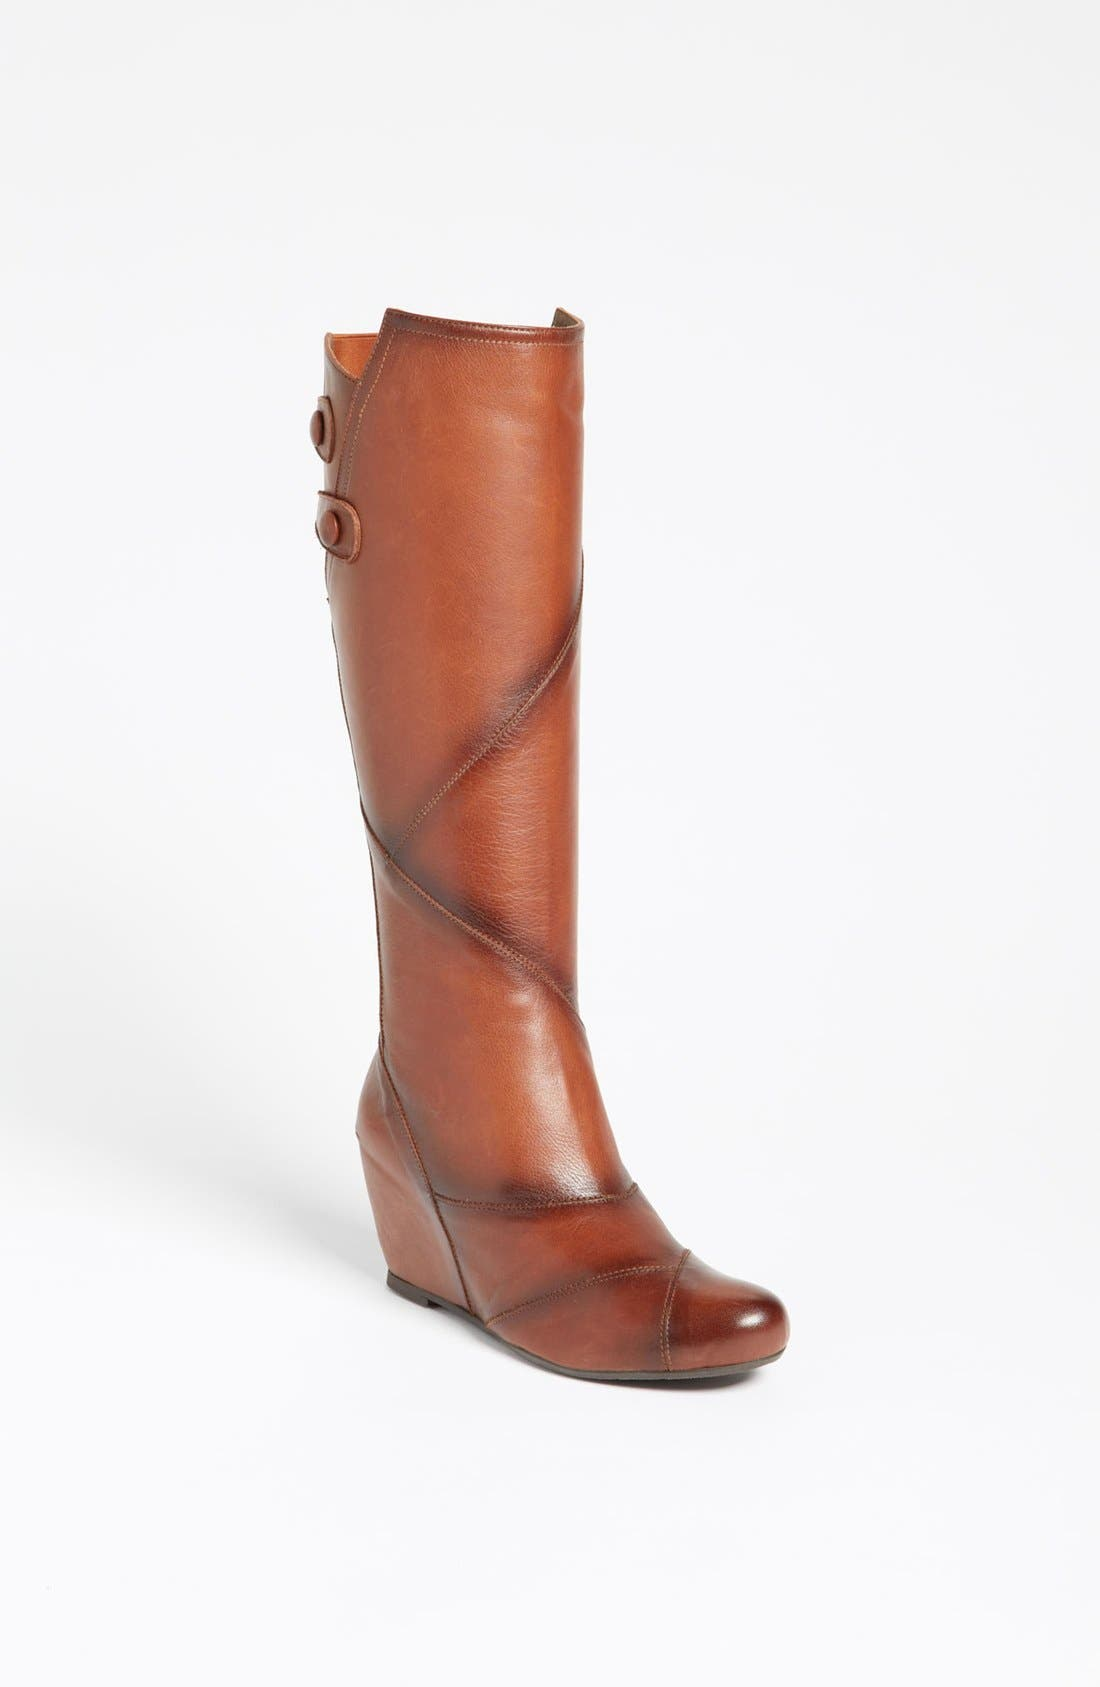 Main Image - Miz Mooz 'West' Boot